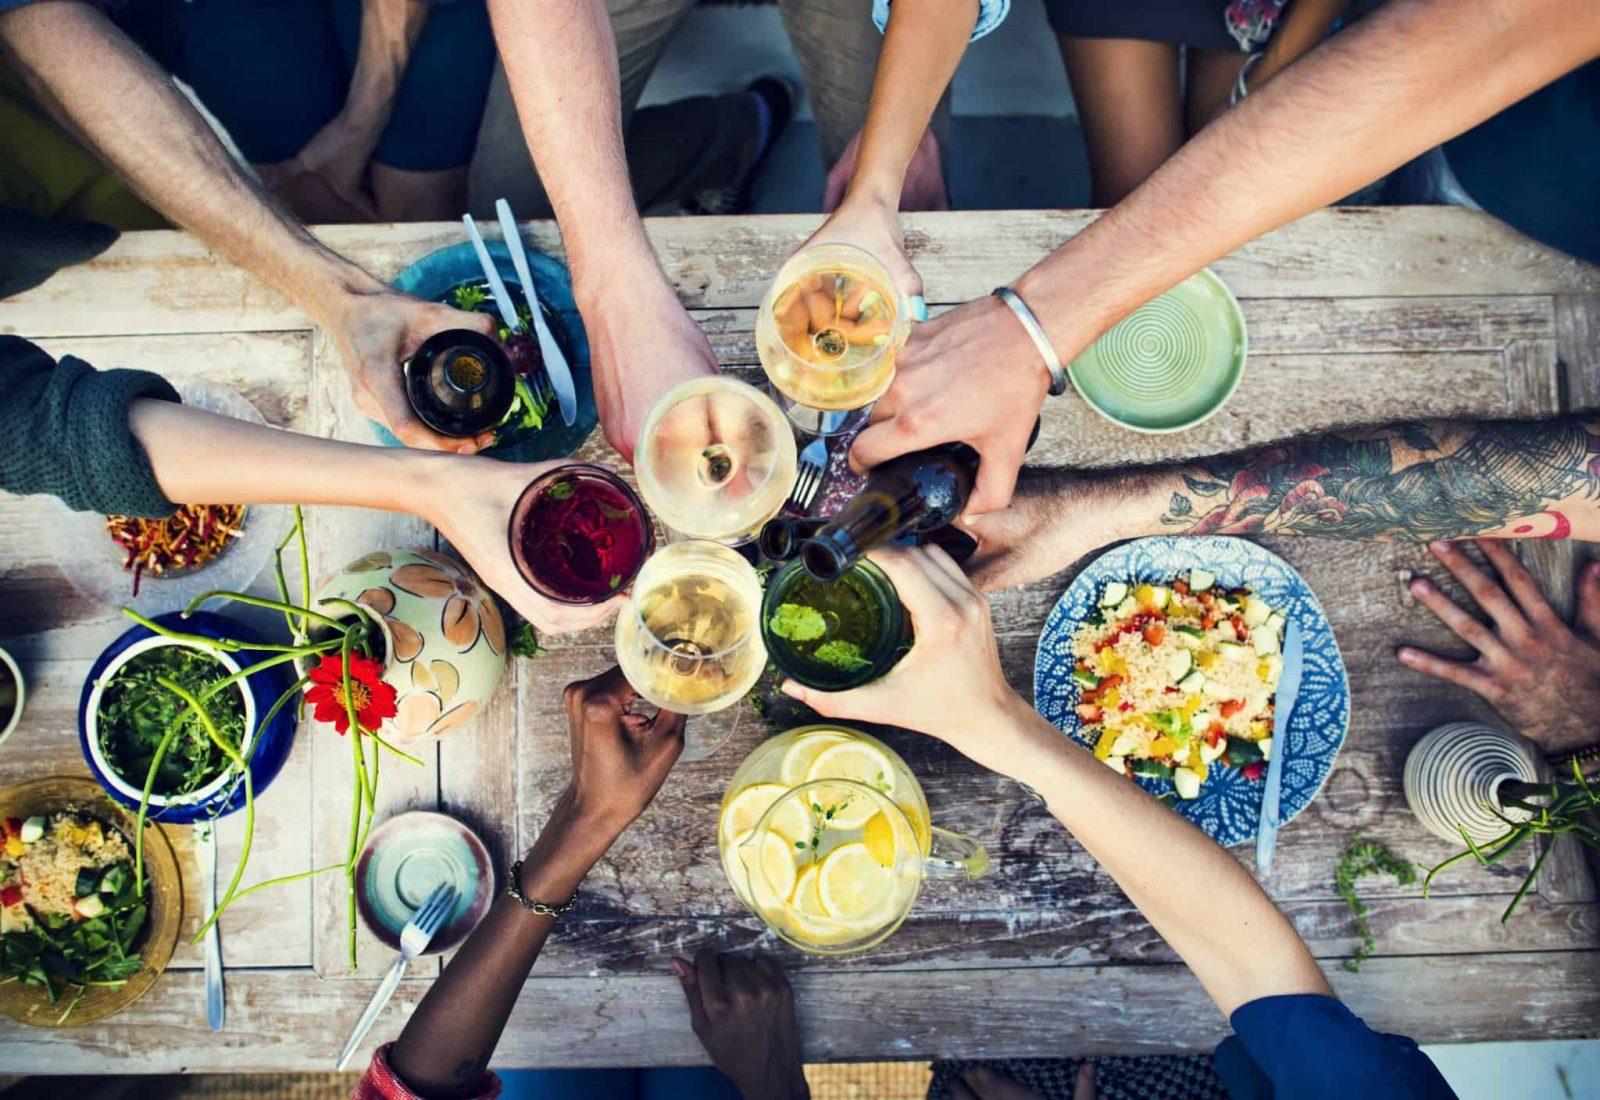 Digital Marketing for Food & Beverage Businesses in Singapore